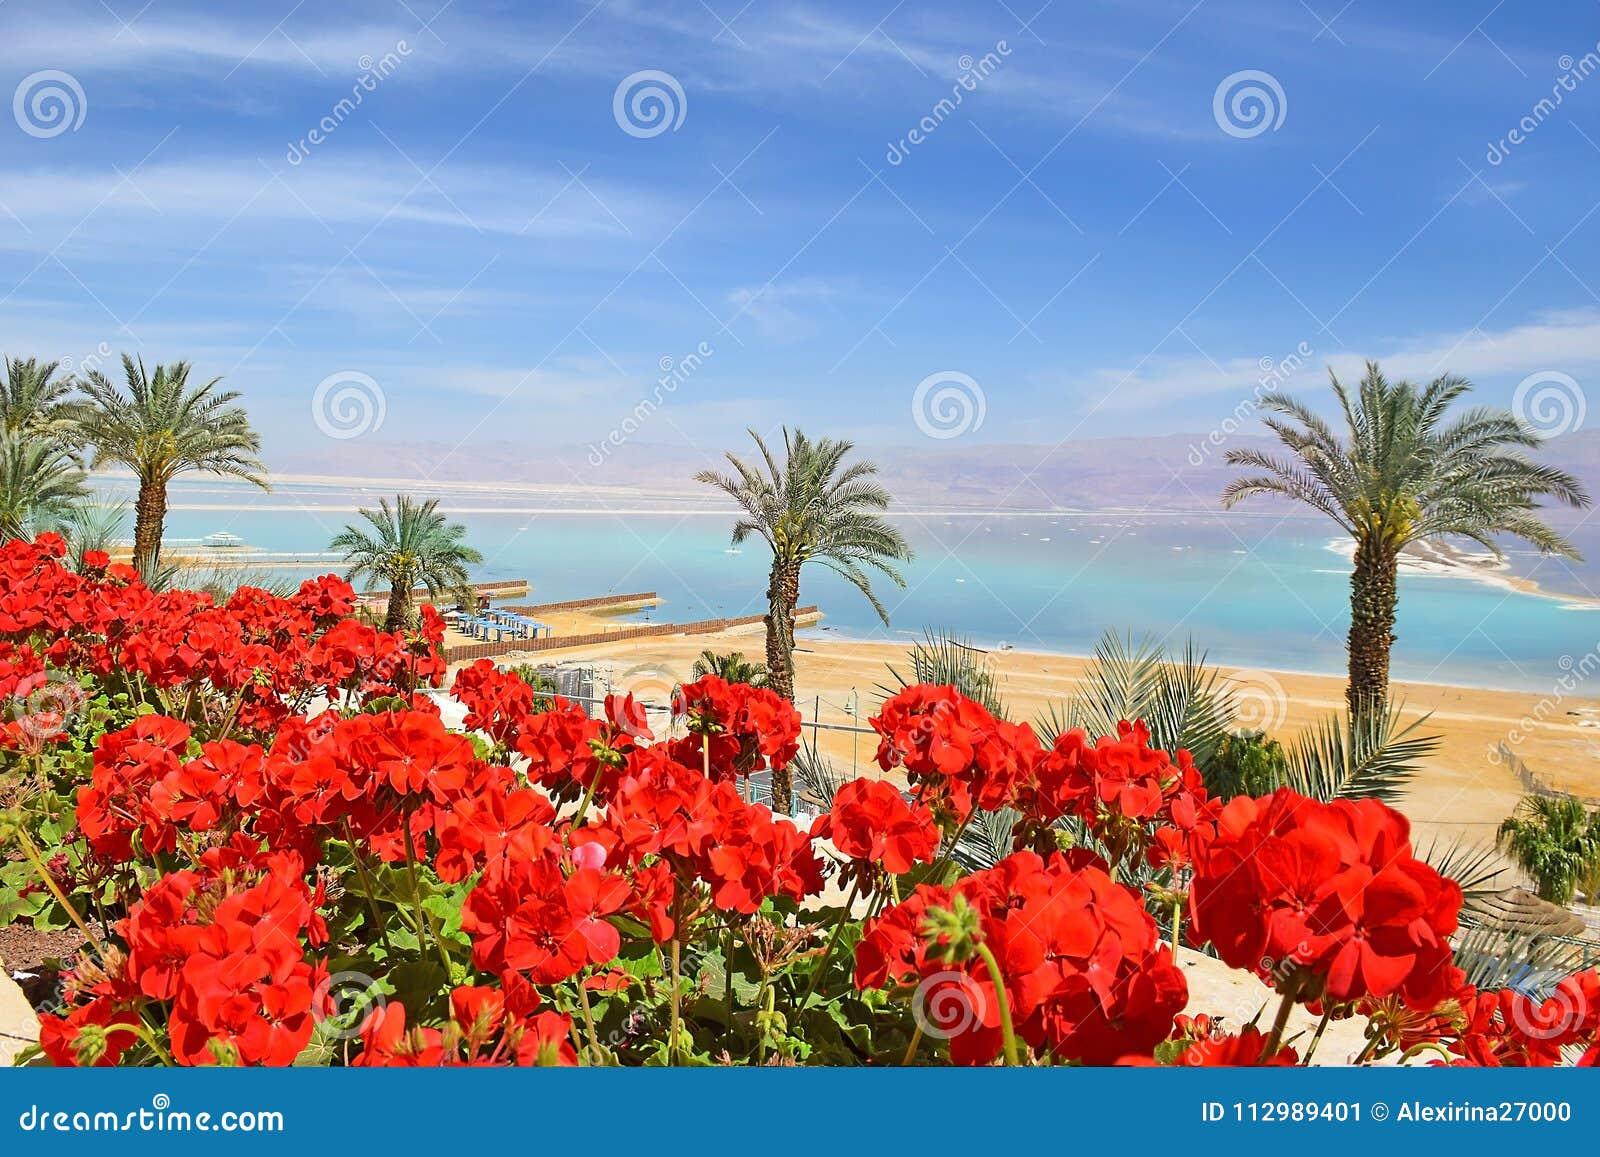 Beach at the Dead Sea, israeli shore